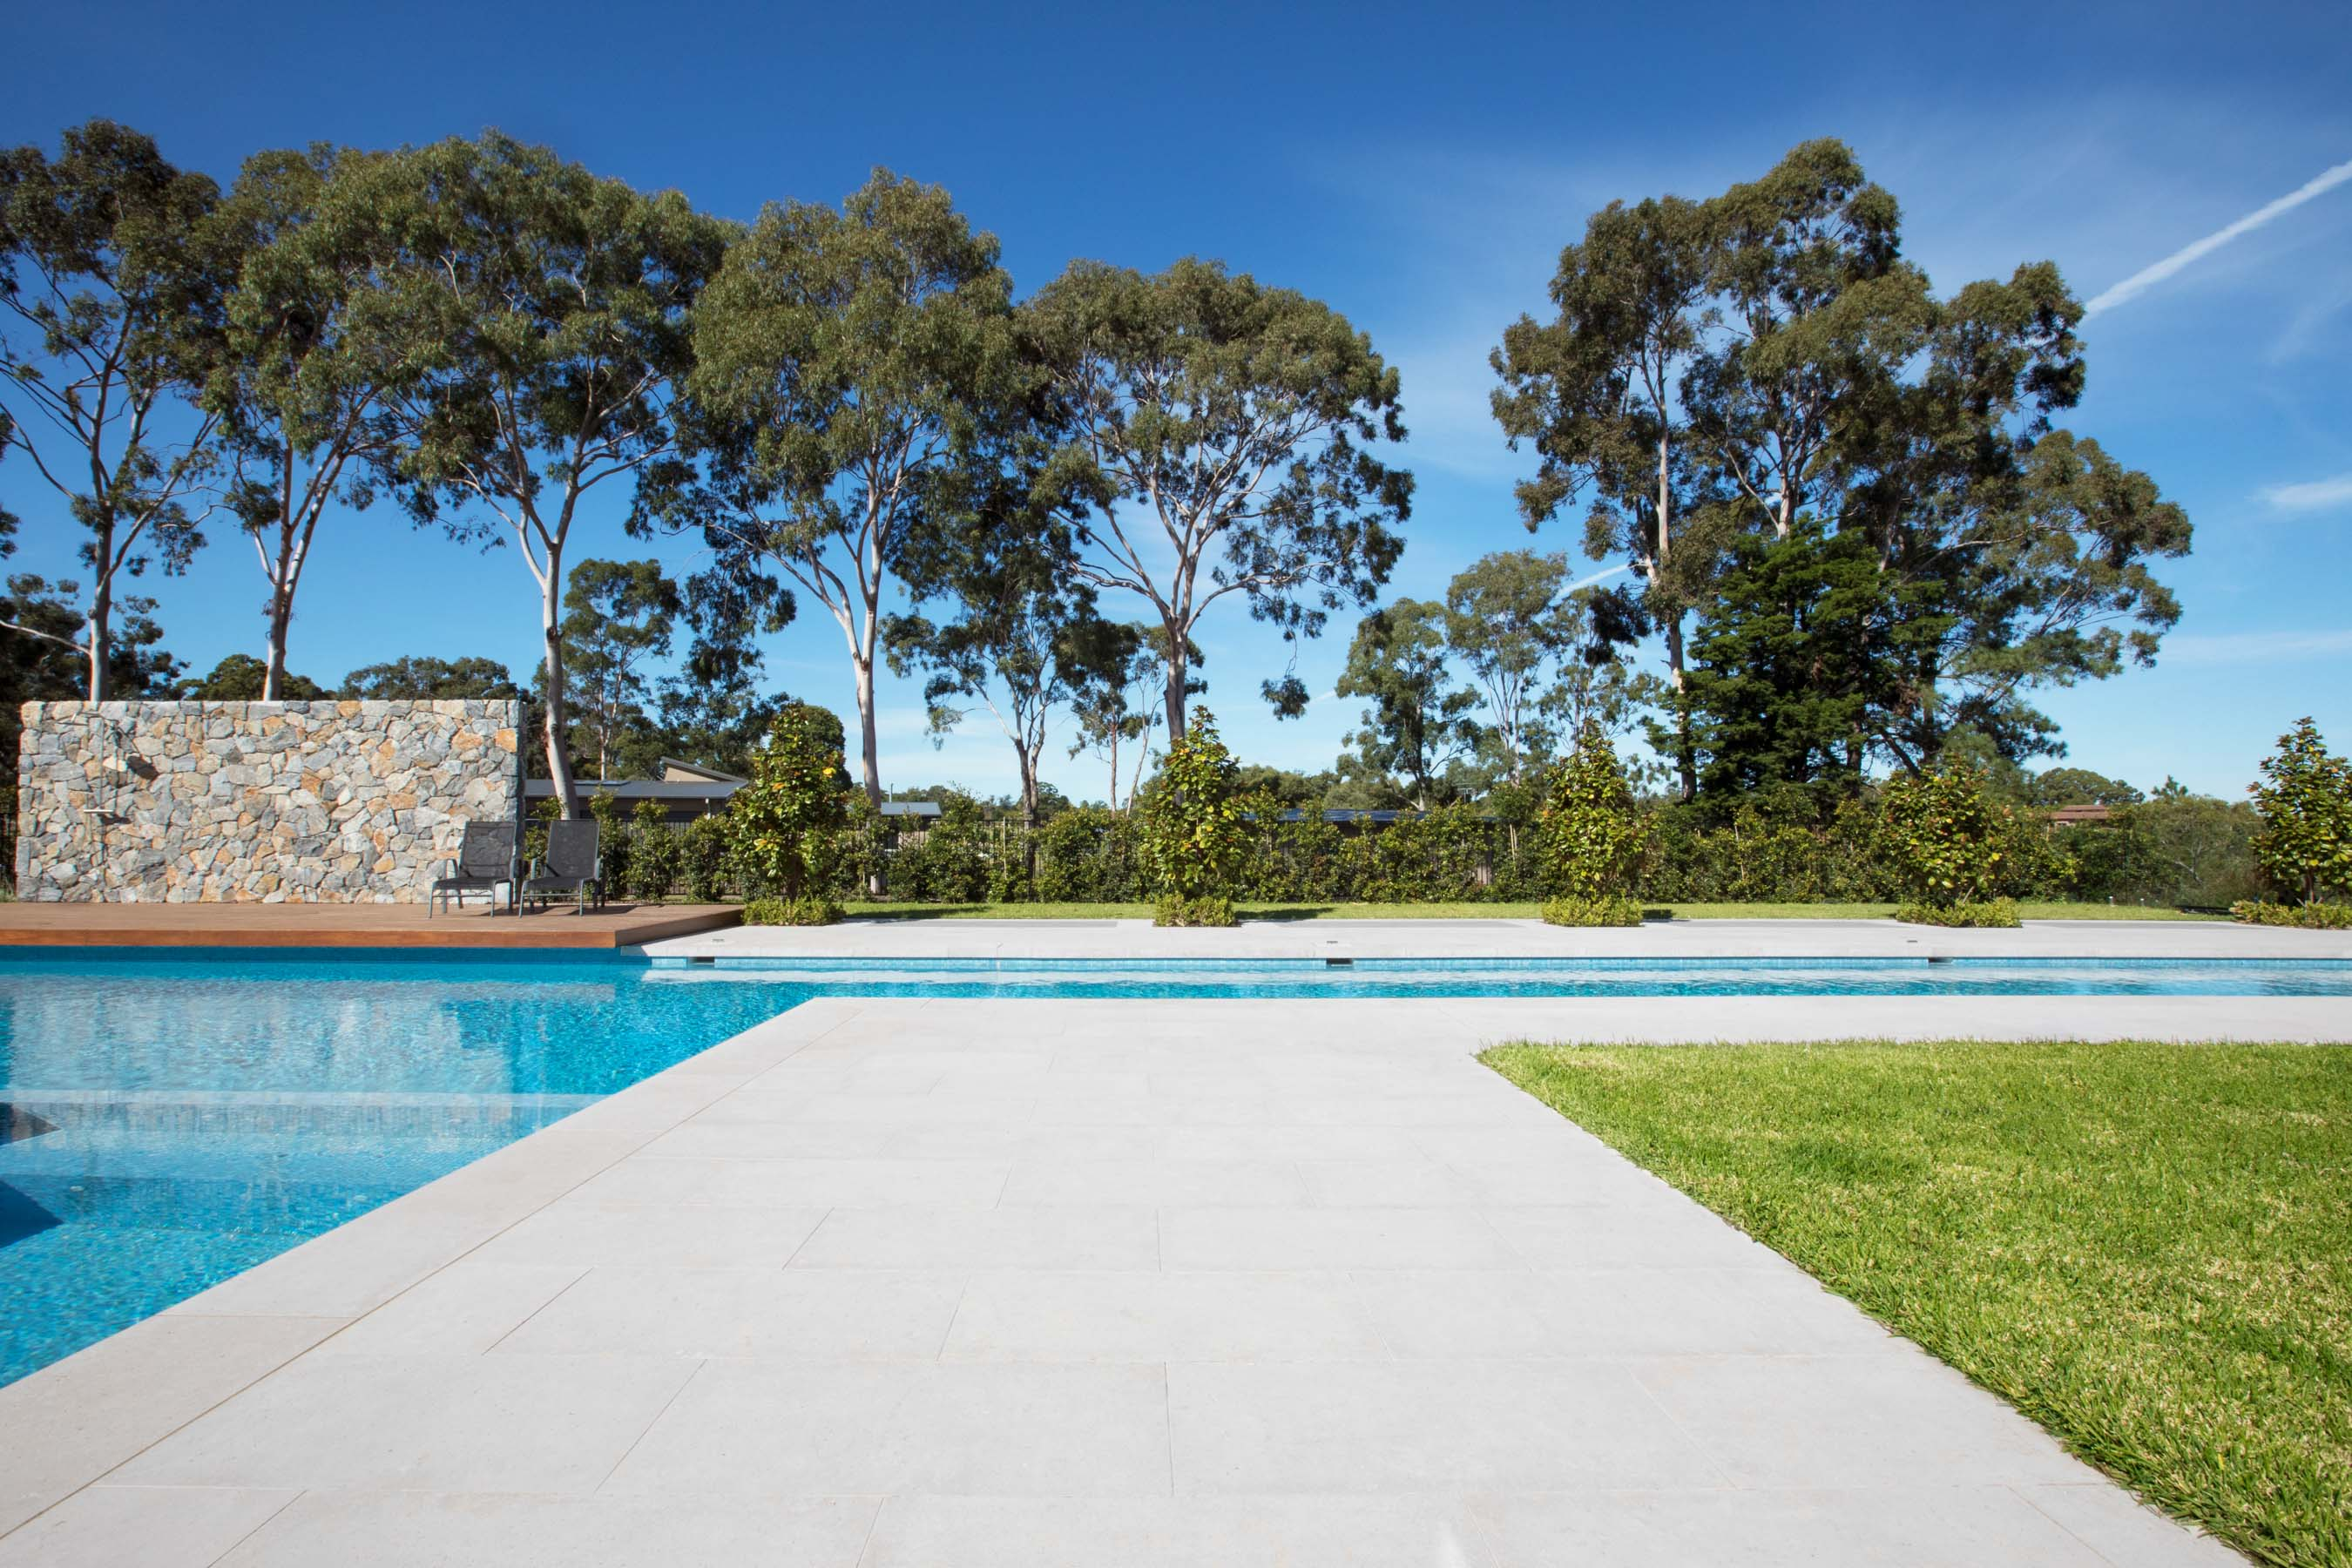 Stone-Pavers-and-Tiles-Outdoor Gallery hiekka-01